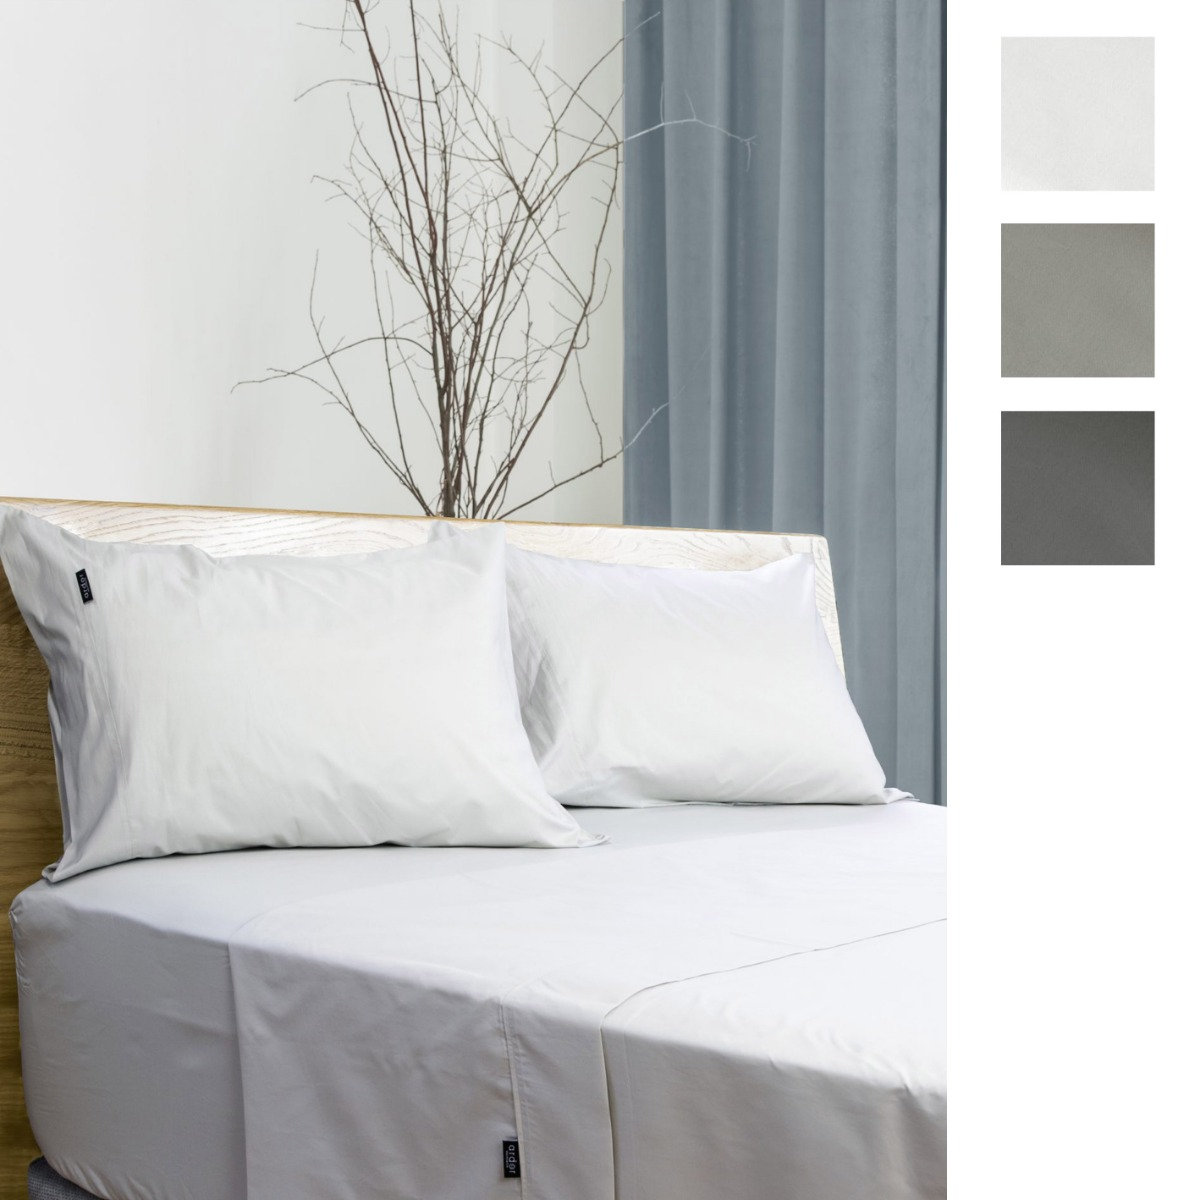 Ardor Home 700 Thread Count Antibacterial Cotton Rich Sheet Set